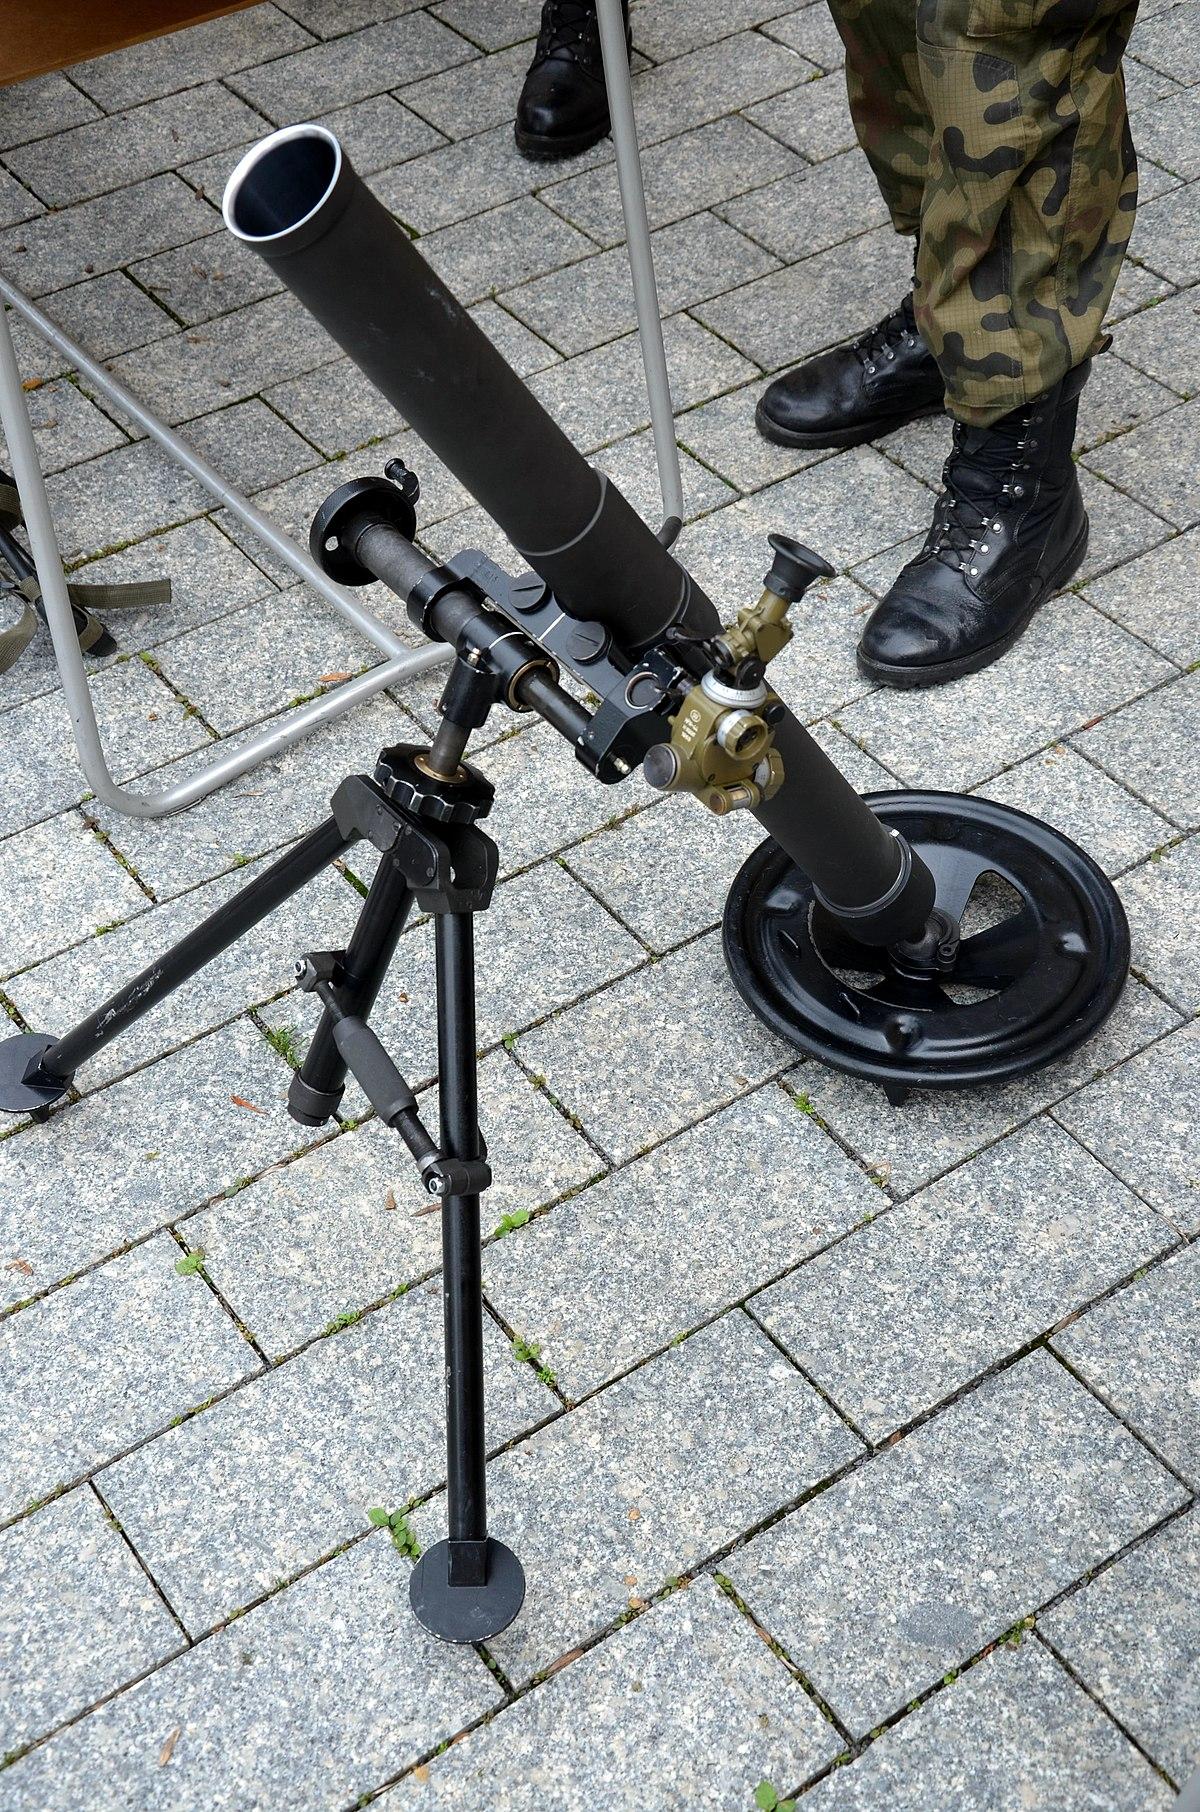 Mortar (weapon) - Wikipedia